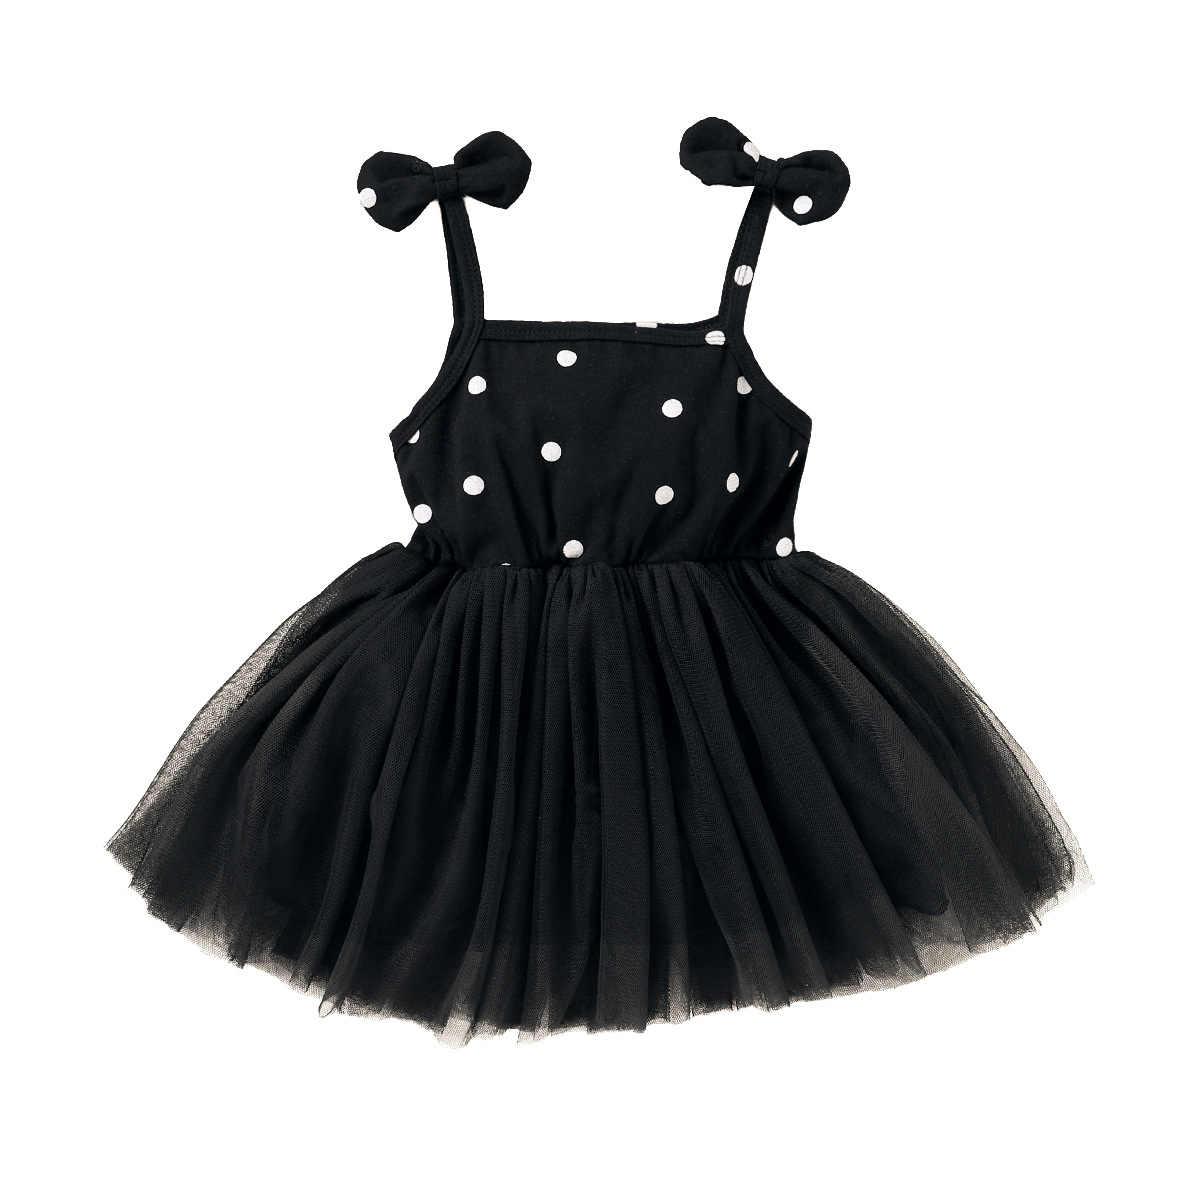 SSMENG Toddler Baby Girls Princess Polka Dot Dress Long Sleeve Mesh Tutu Wedding Party Sundress